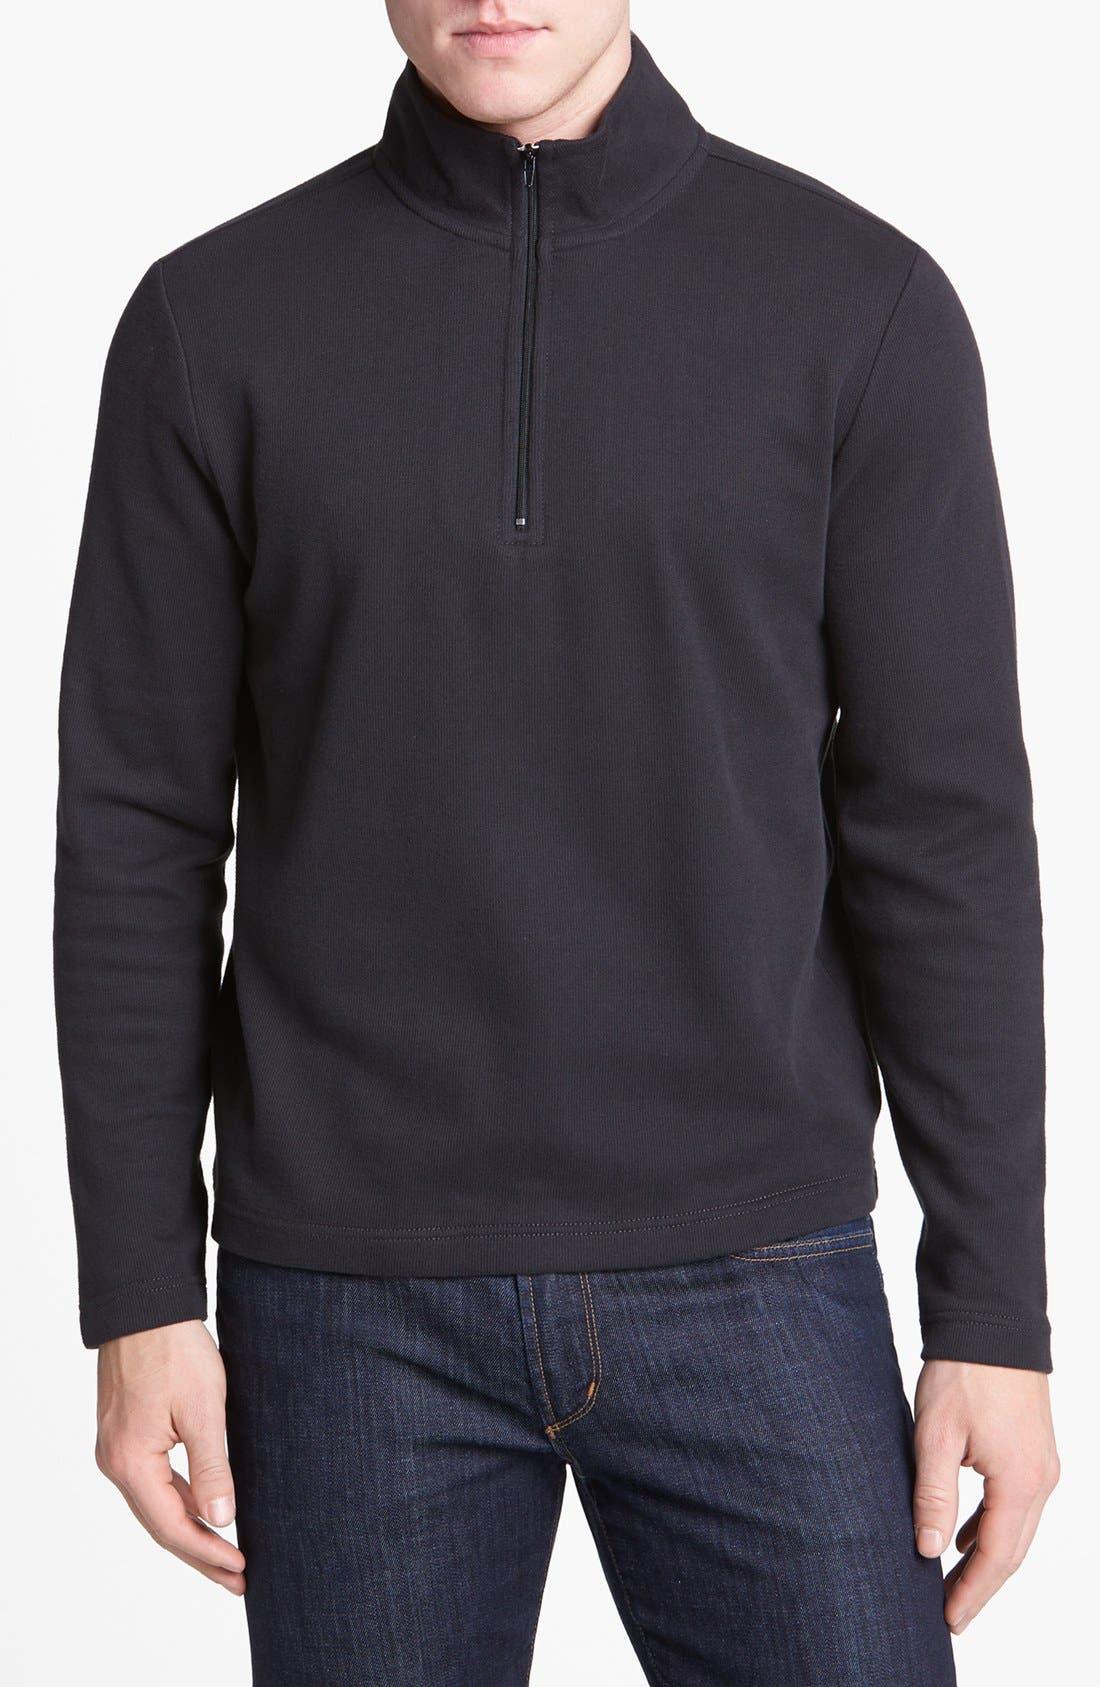 Main Image - Robert Barakett 'Niles' Half Zip Sweatshirt